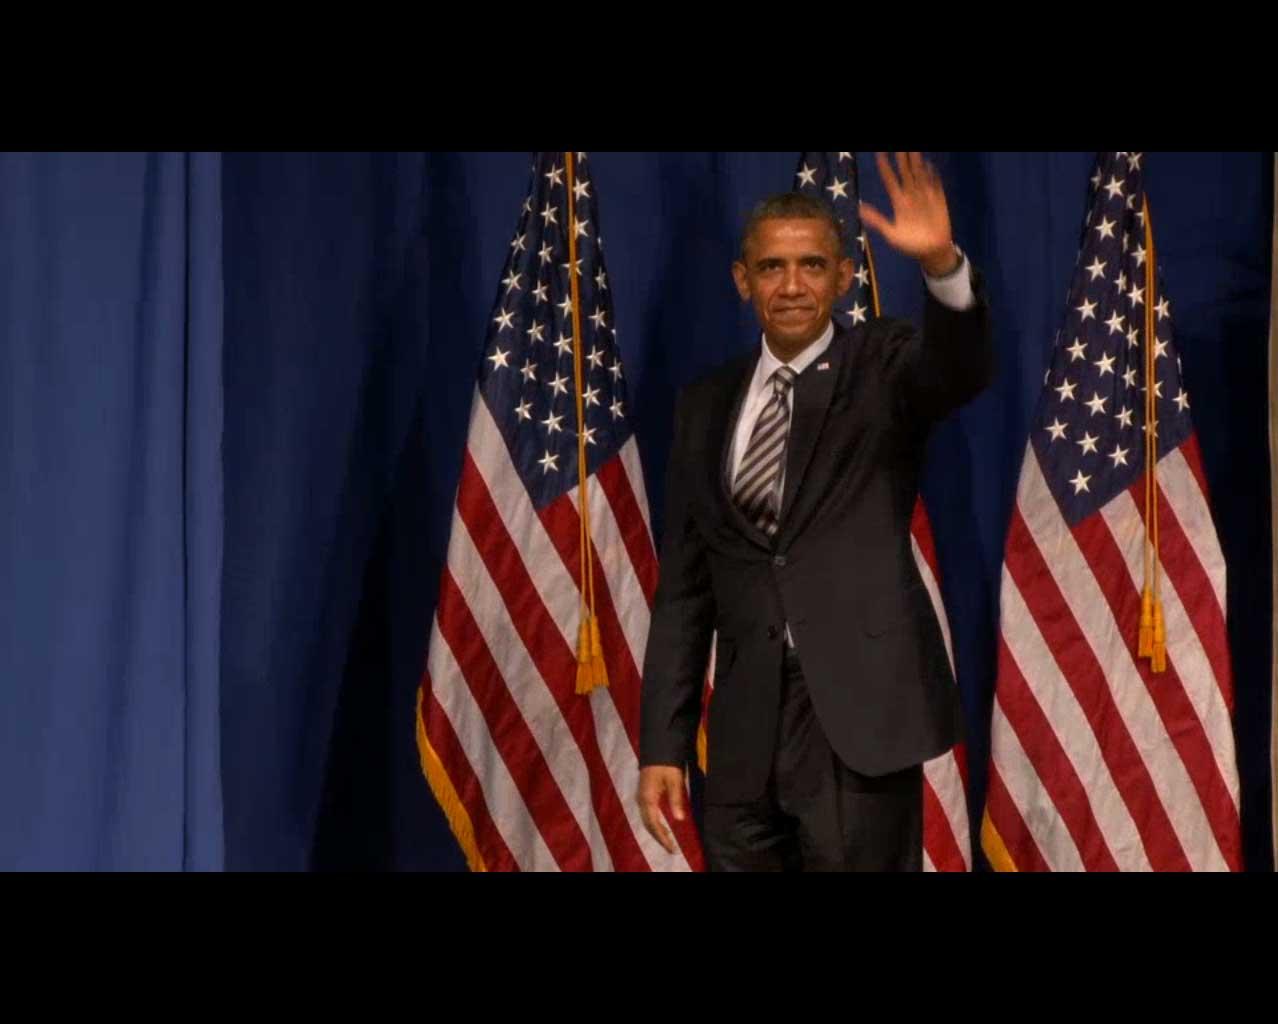 president obama on planet mars - photo #37